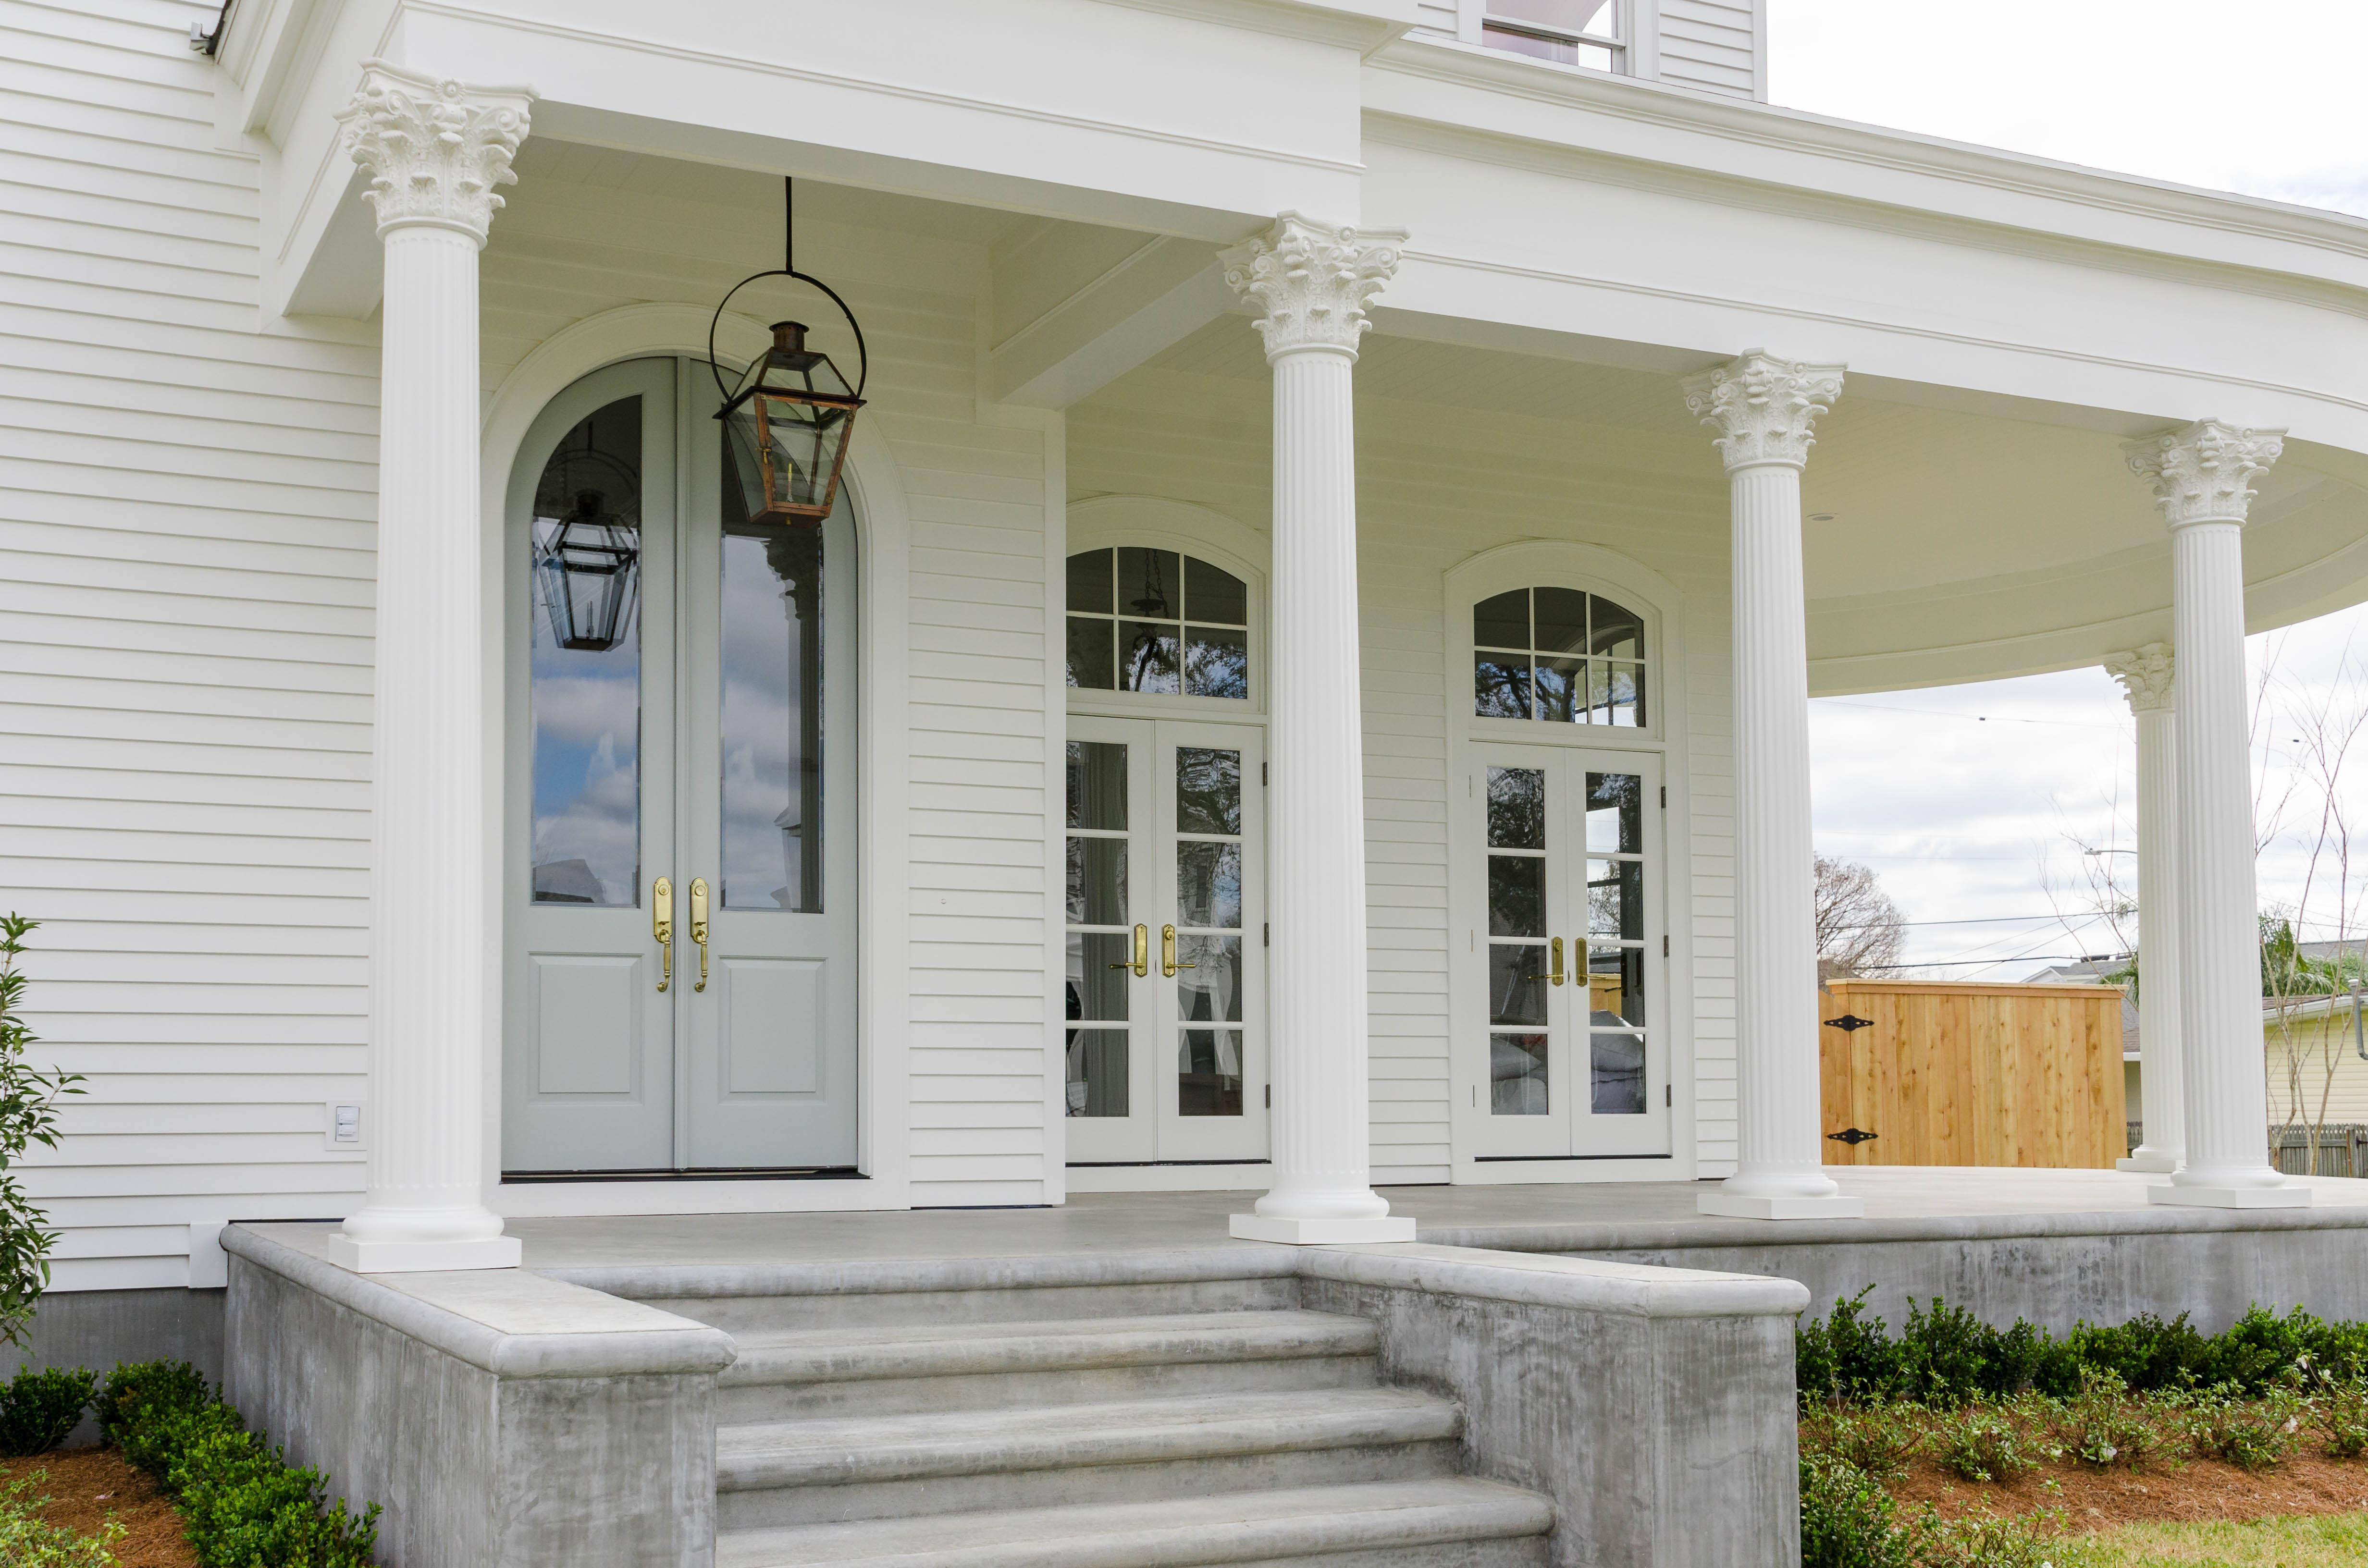 House Columns Product : Columns greek ionic roman corinthian jefferson